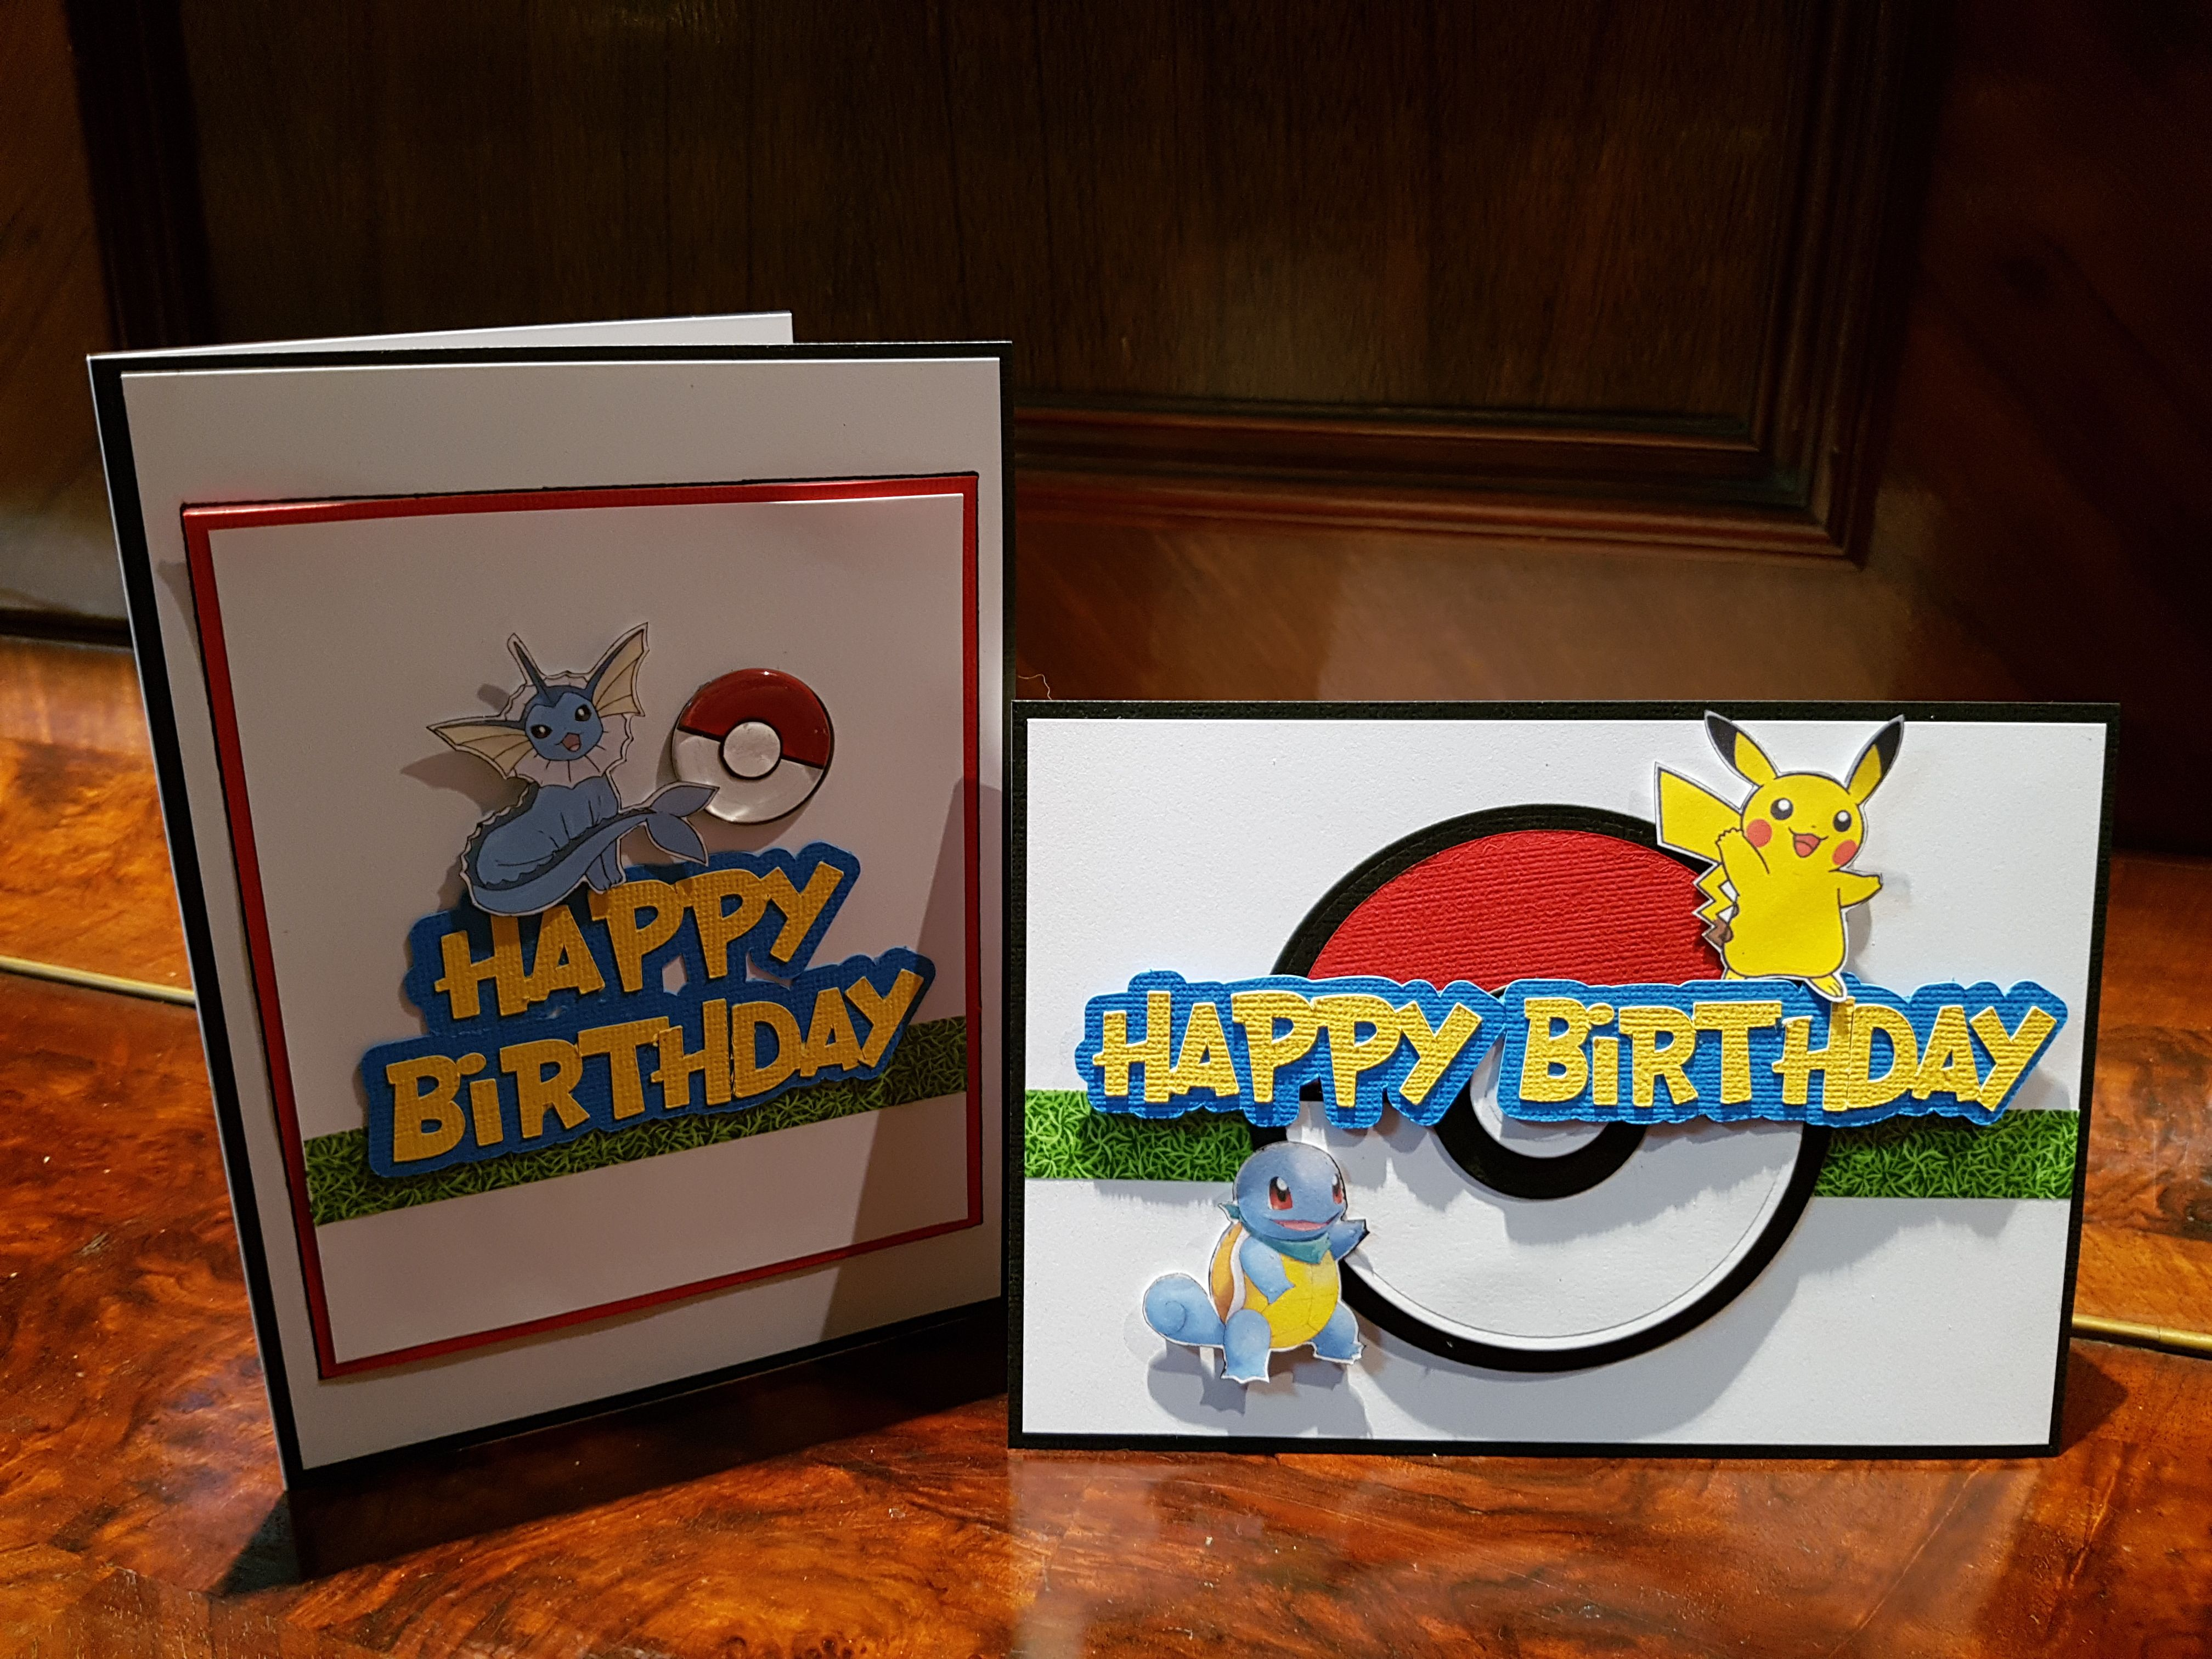 Handmade Pokemon Themed Birthday Cards Process video is on my